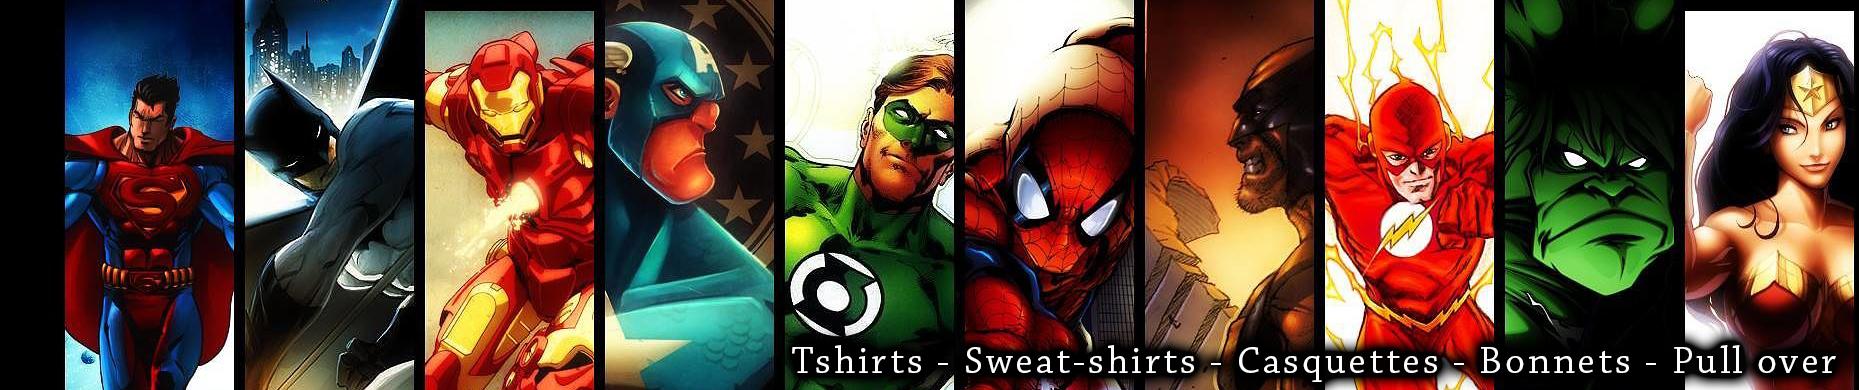 Infinity Gauntlet cotton division Tapis de Sol Spider-Man Marvel